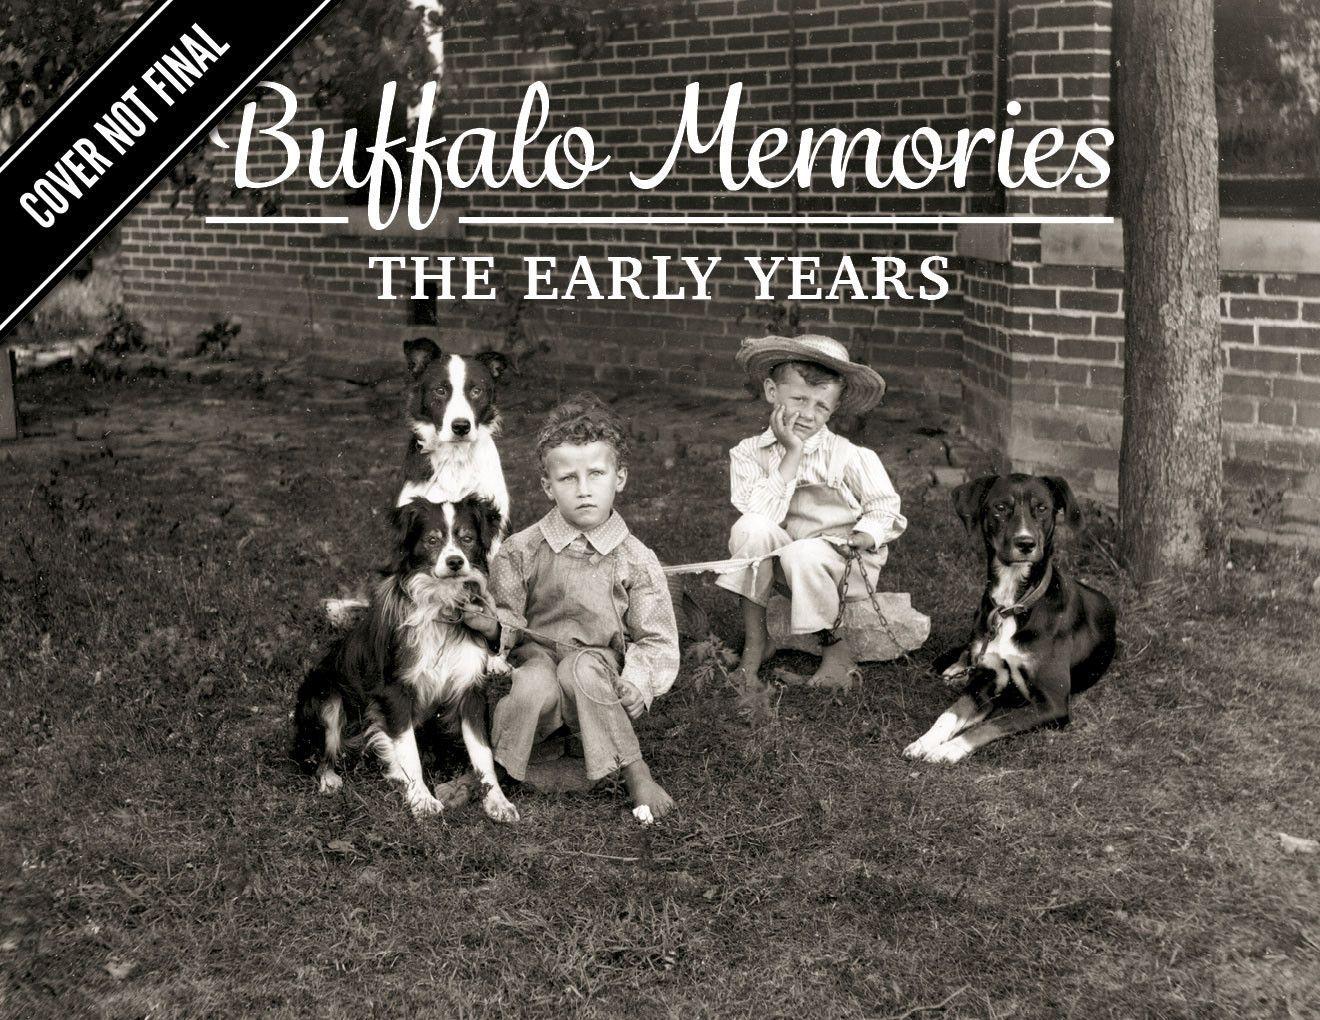 Buffalo Memories: The Early Years